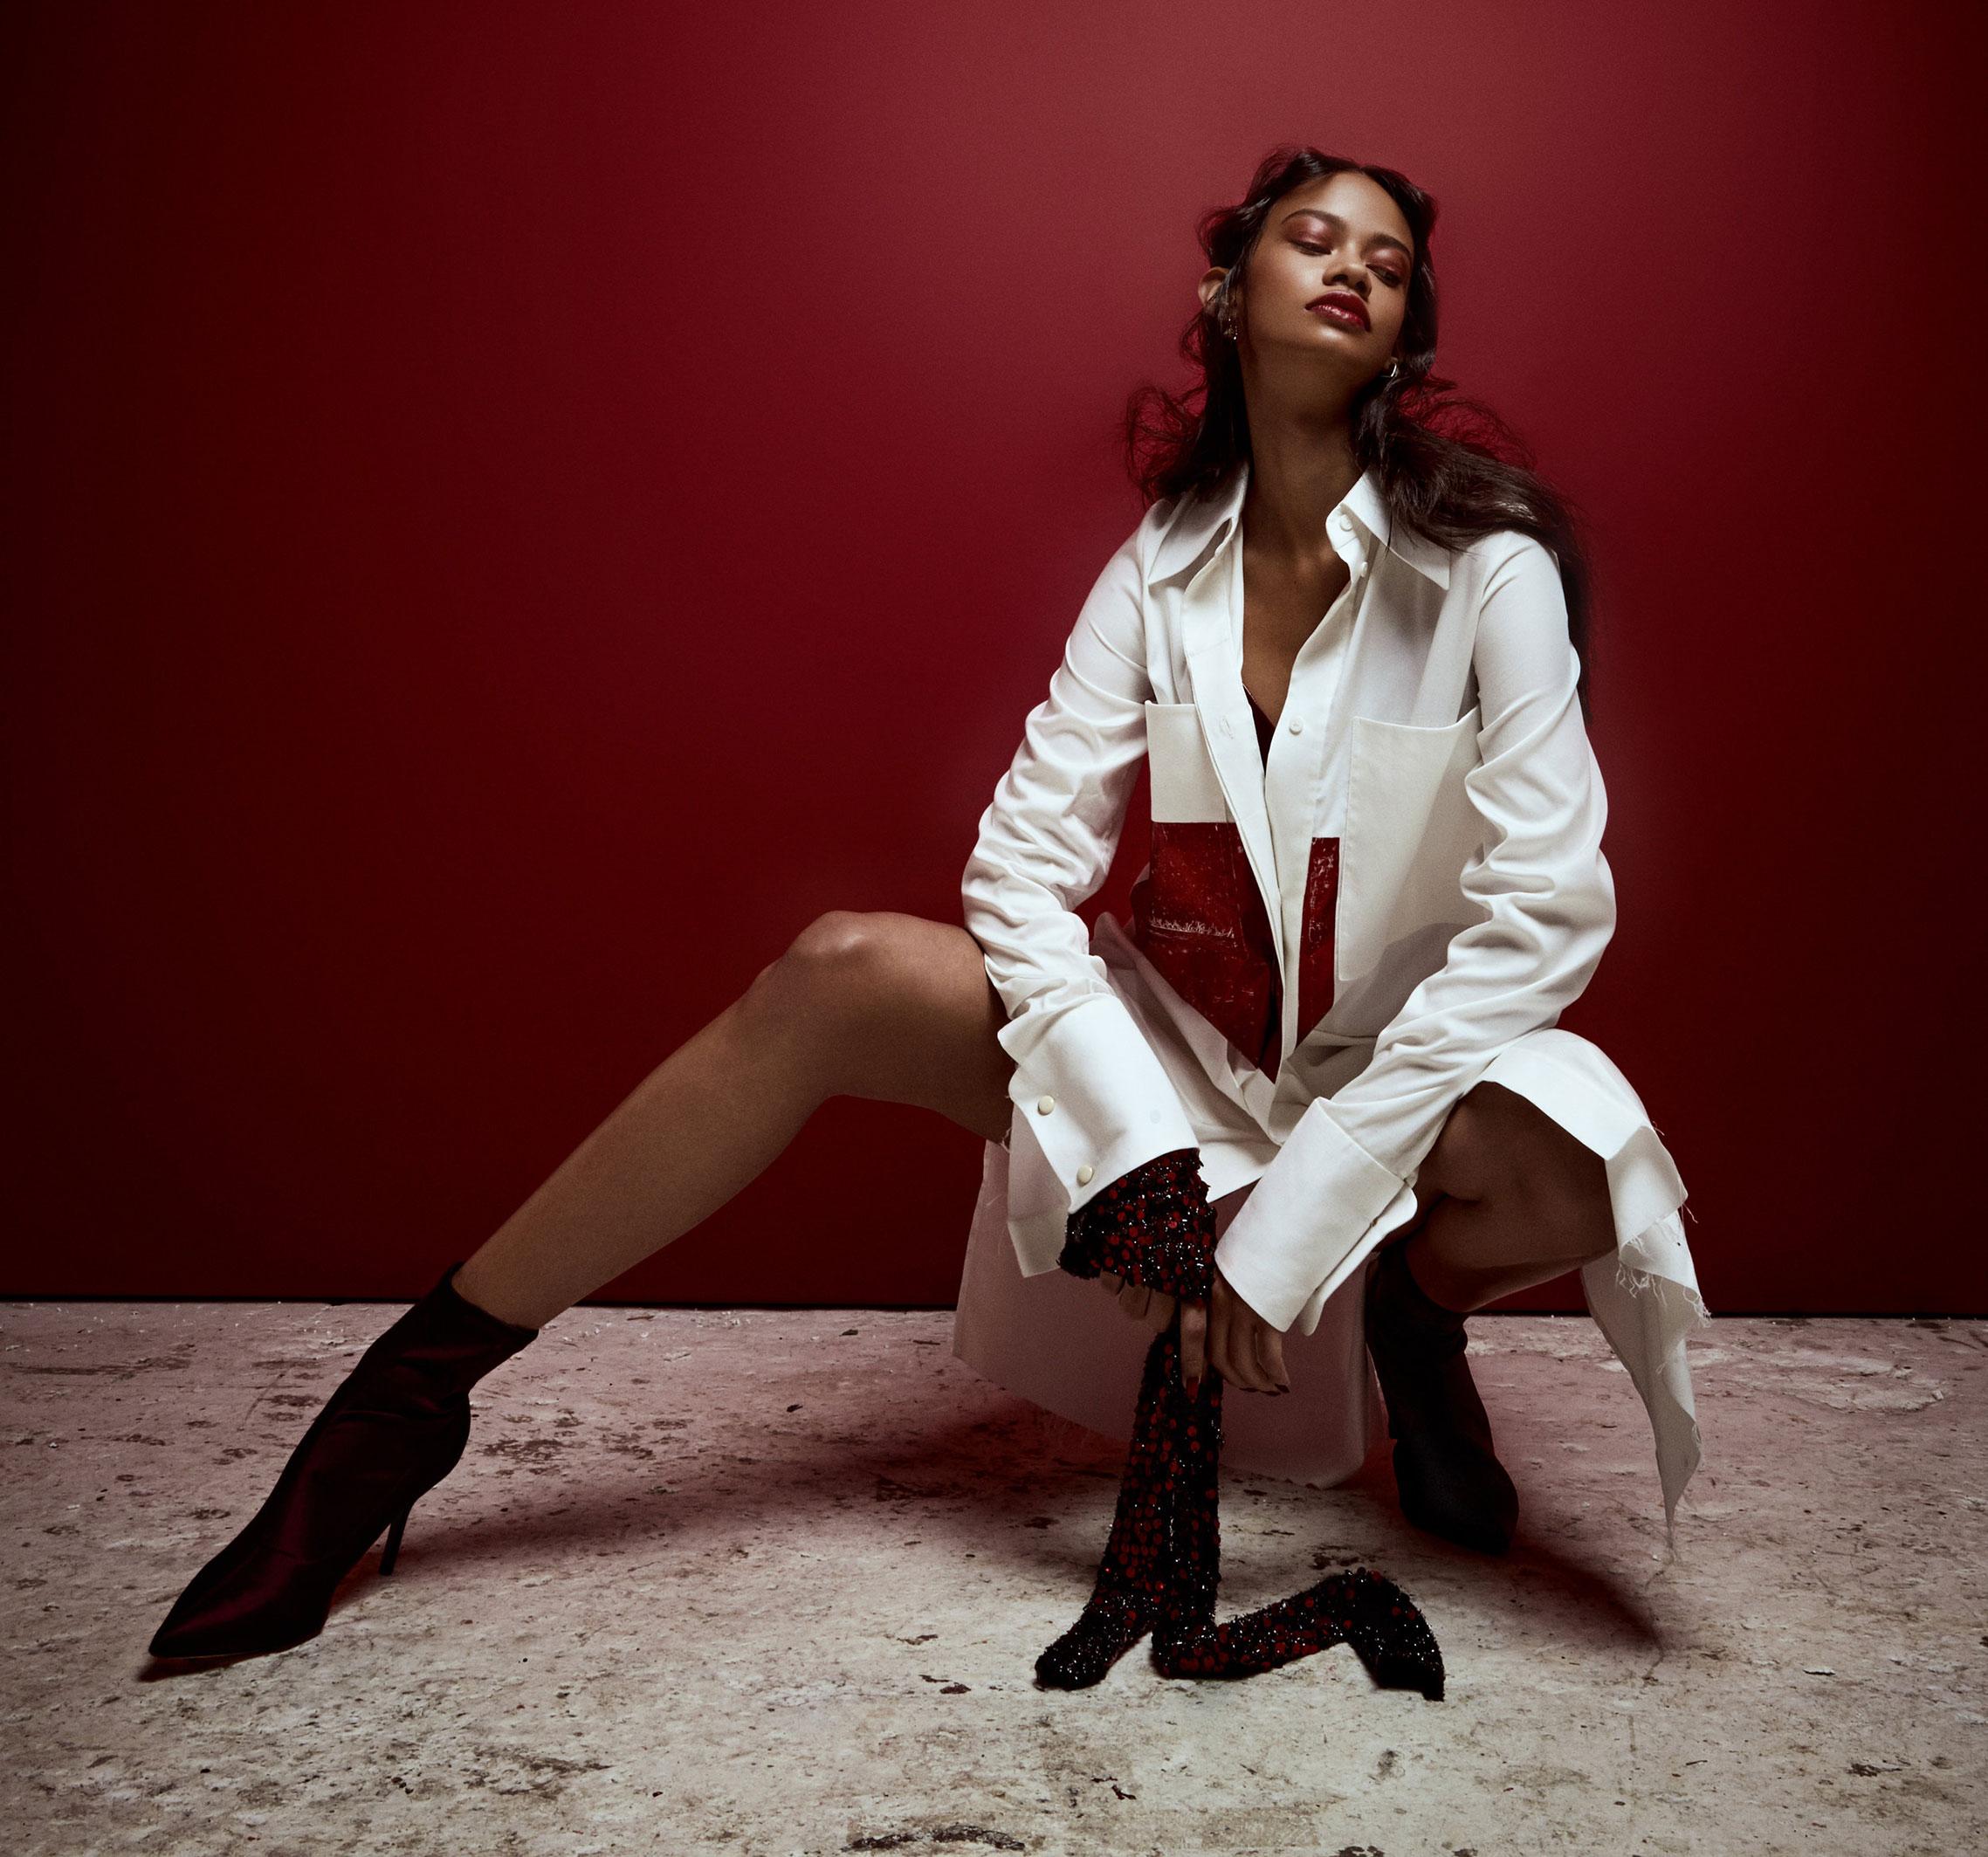 Таис Мартинс - женщина в красном / фото 01